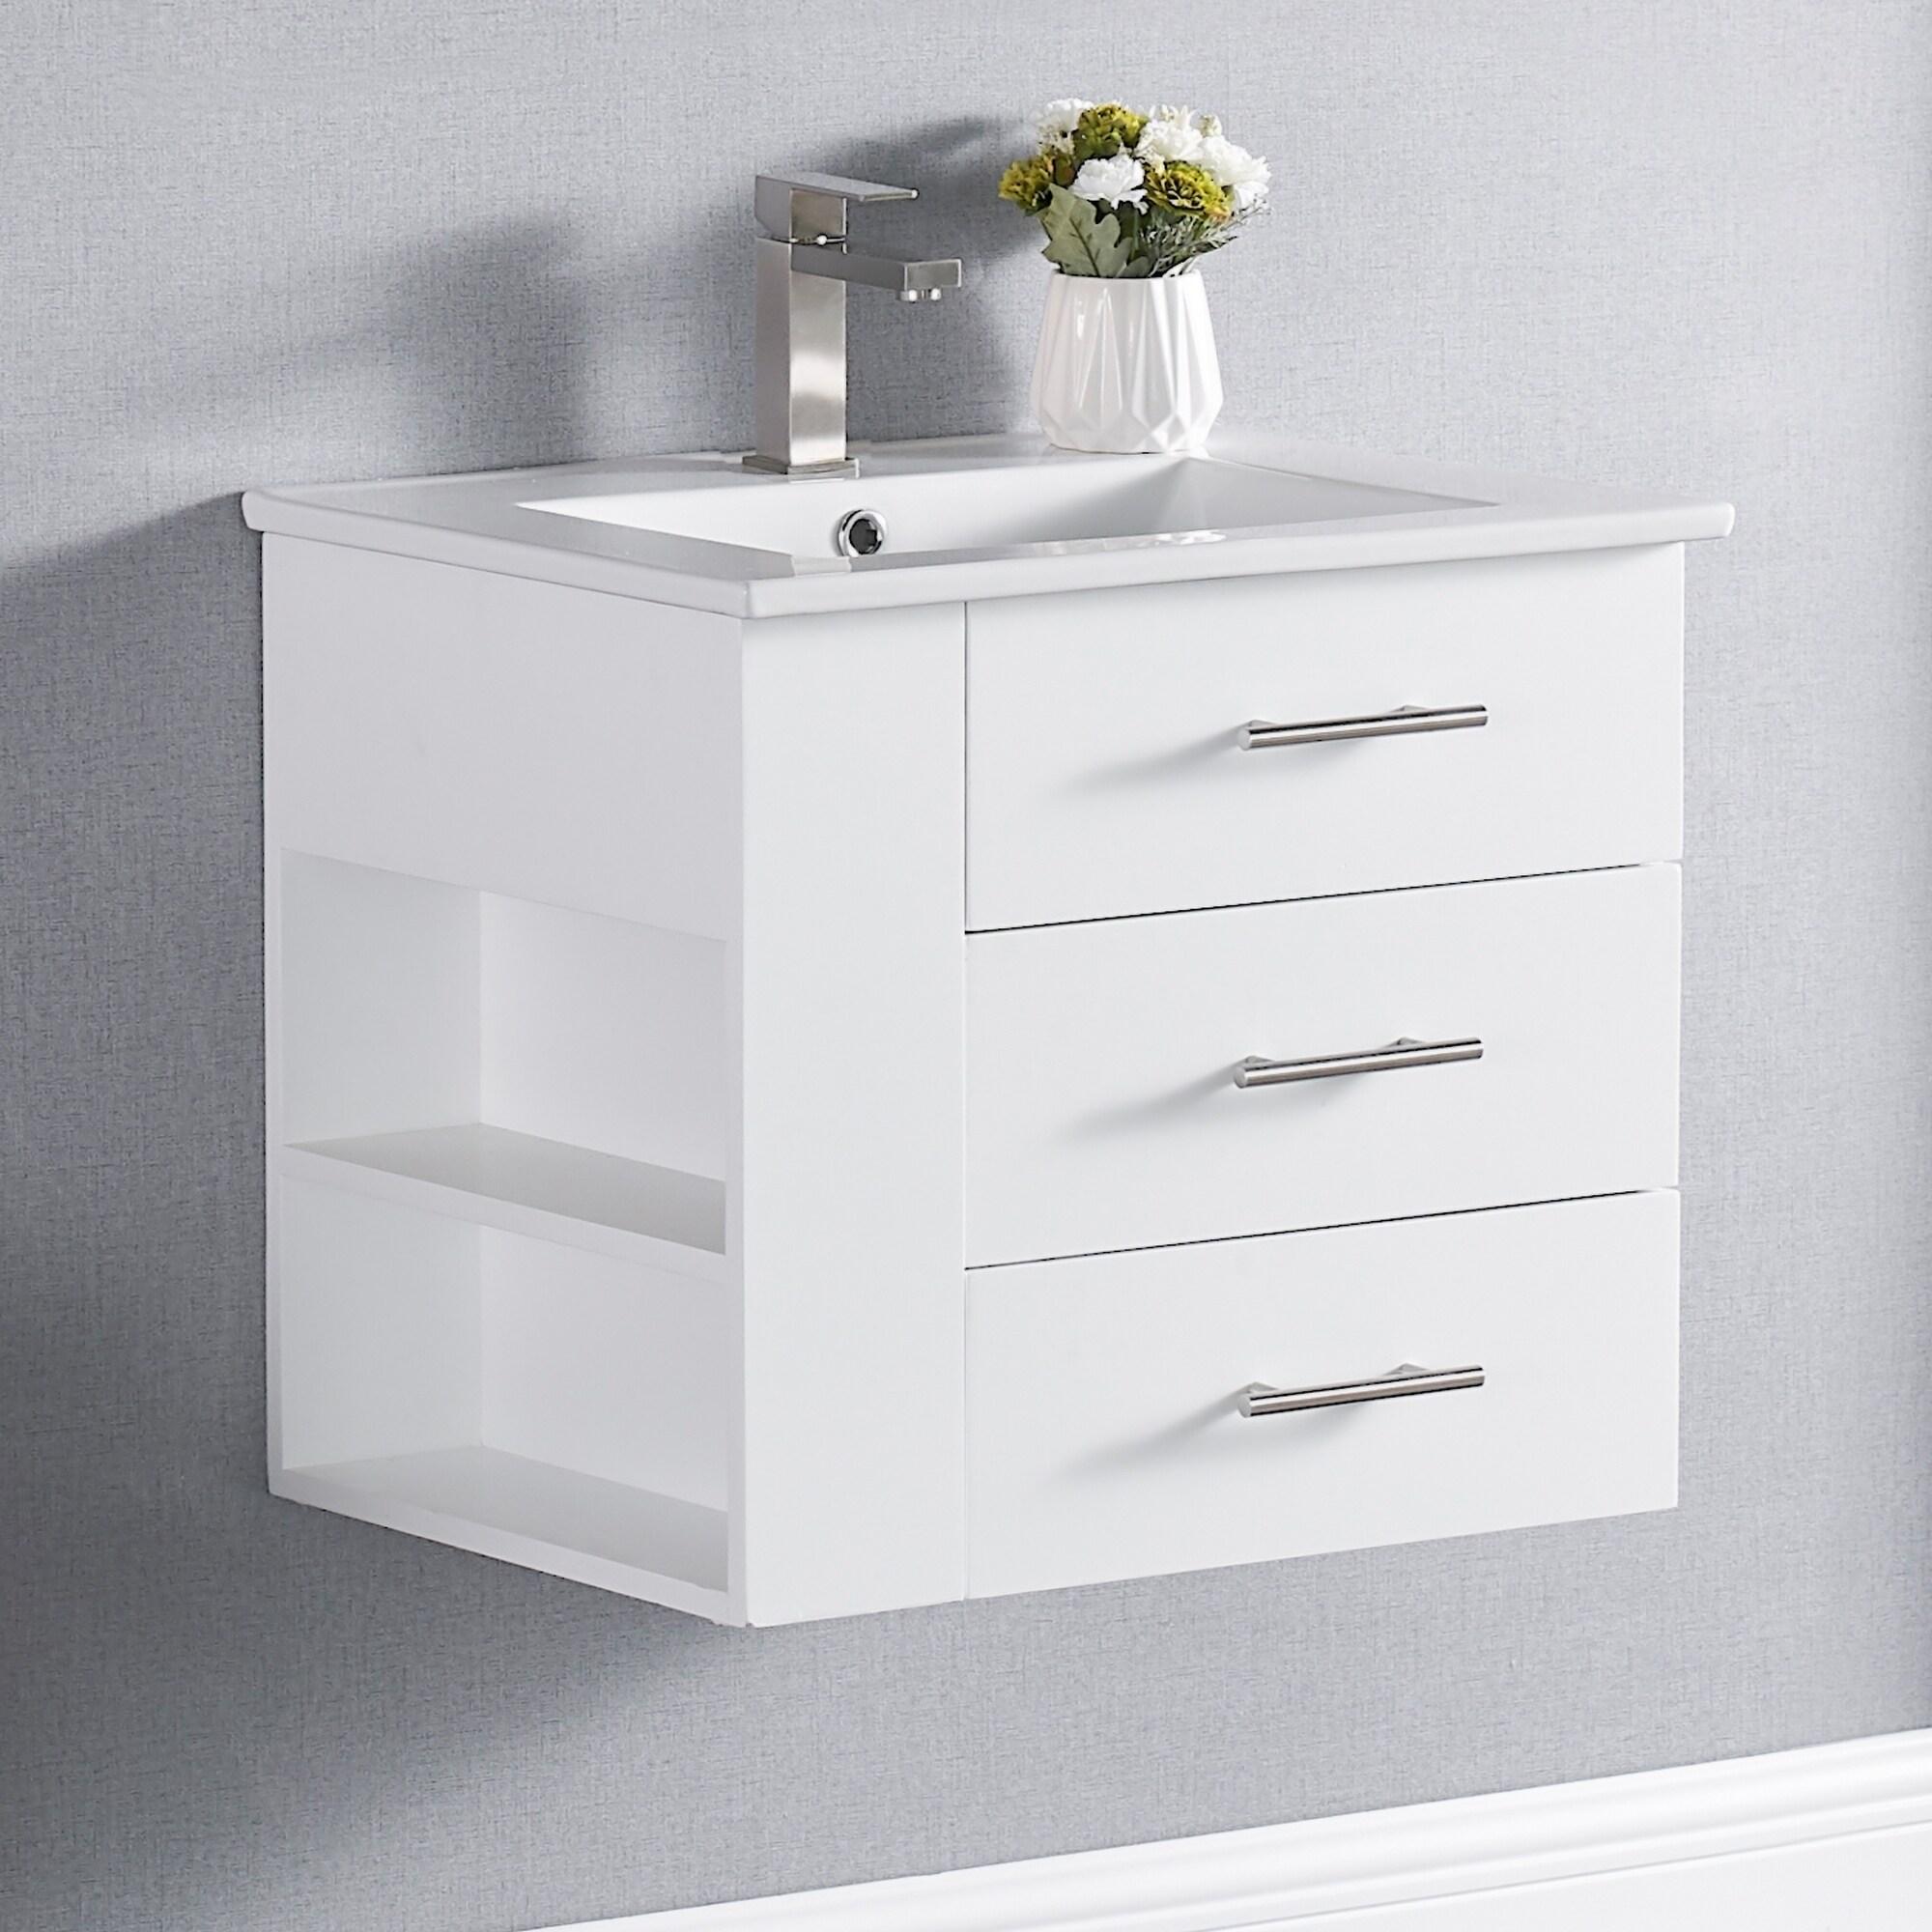 24 Inch Single Sink Wall Mount Bathroom